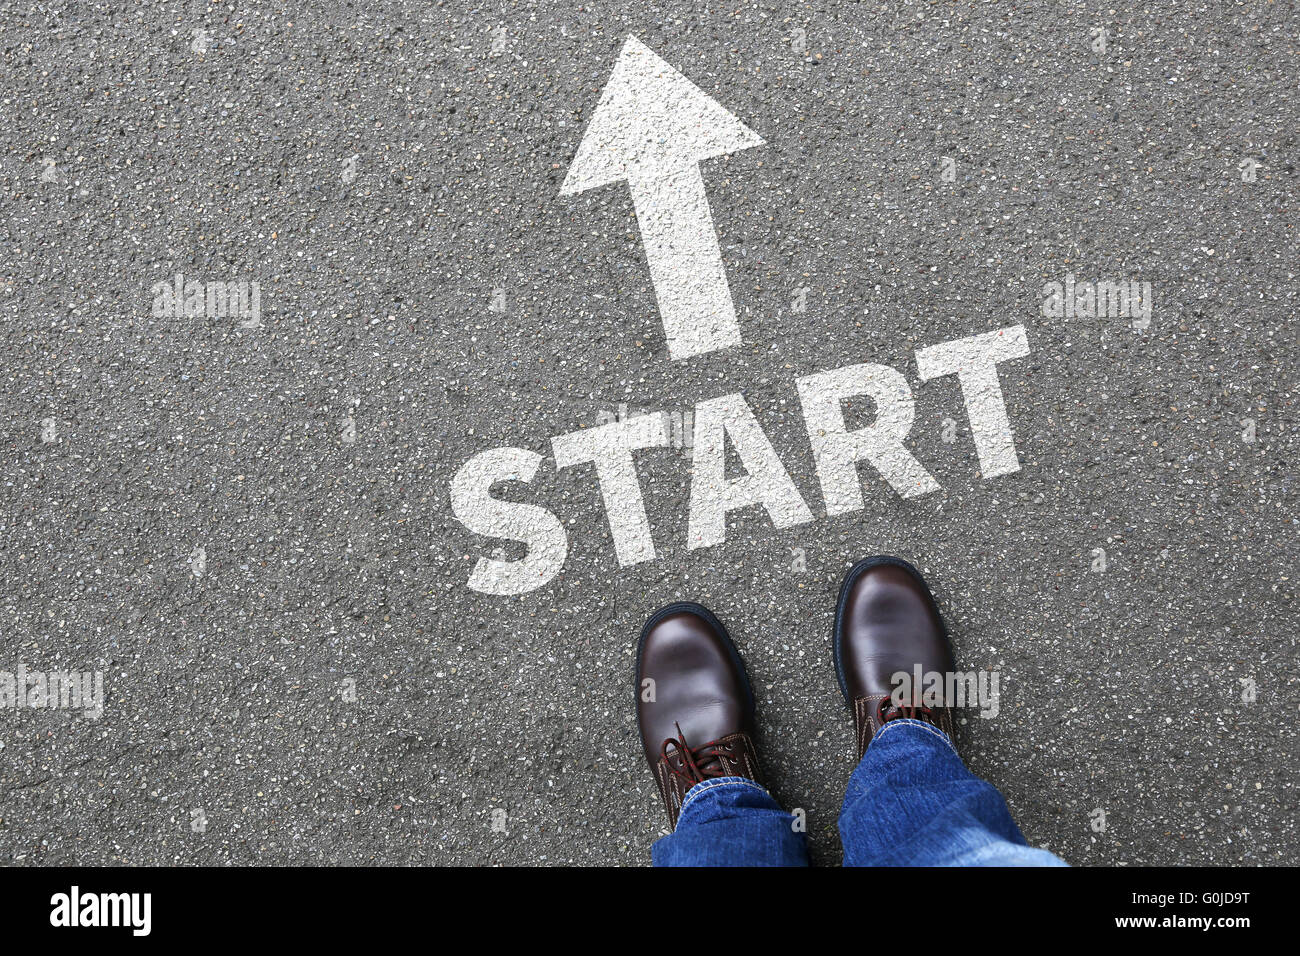 Start starting begin beginning businessman business man concept career goals motivation vision - Stock Image